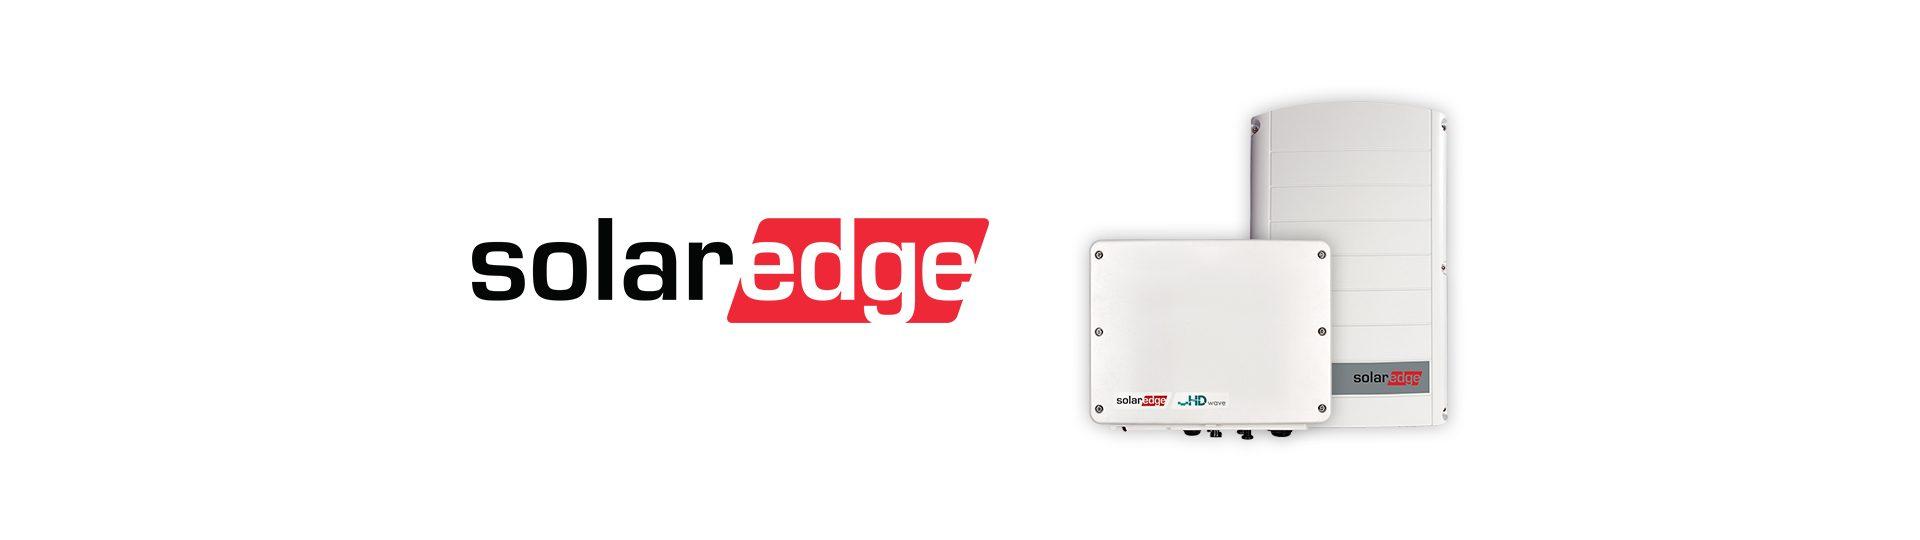 products-logo-solaredge-inverters